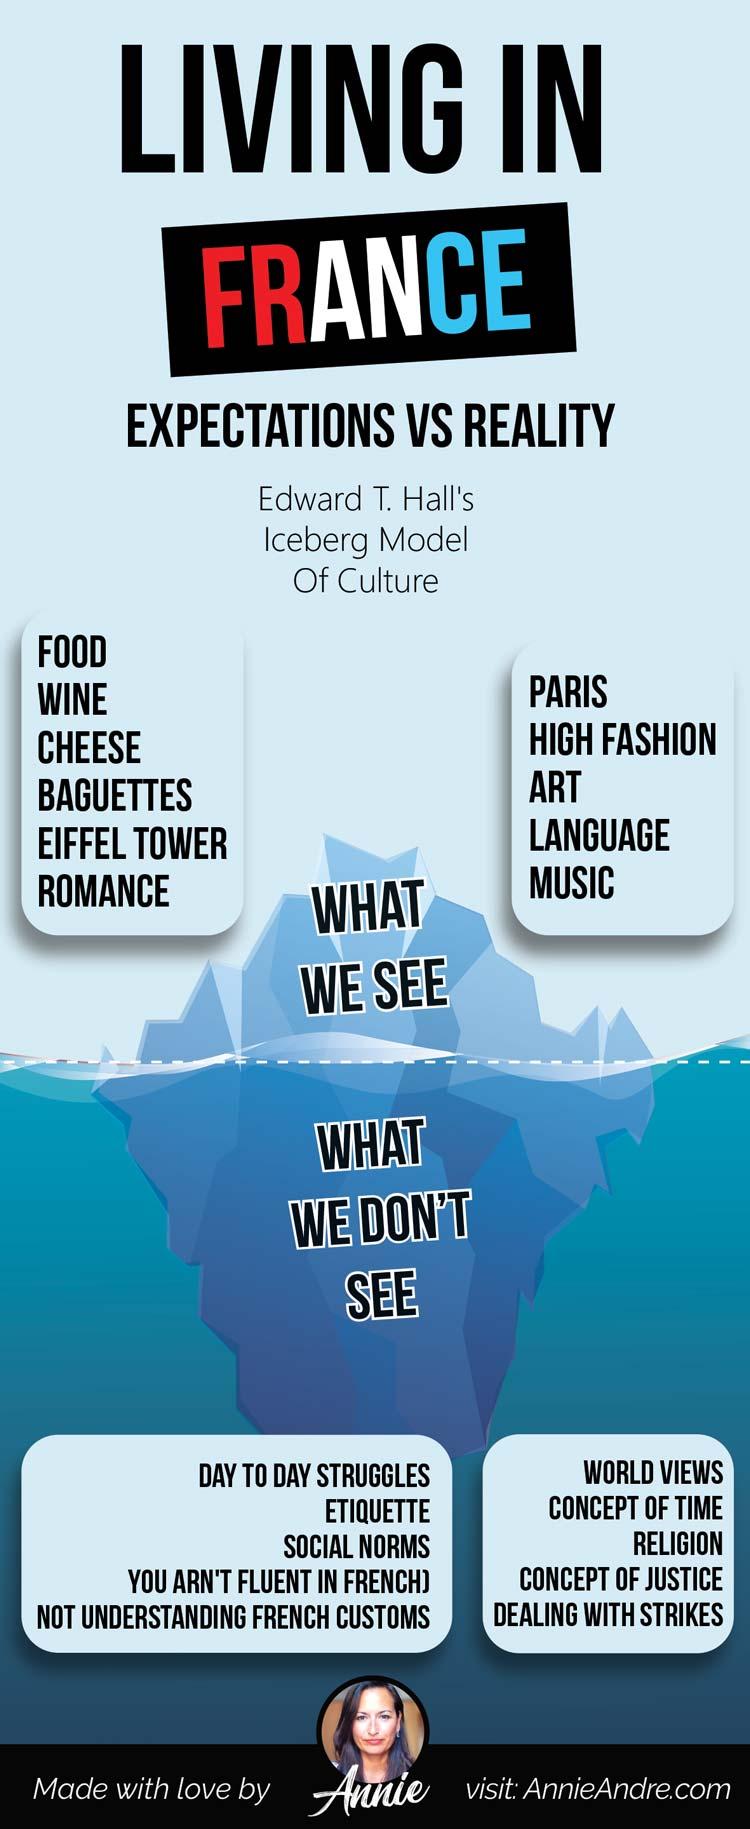 Edward T. Hall's Iceberg Model Of Culture: